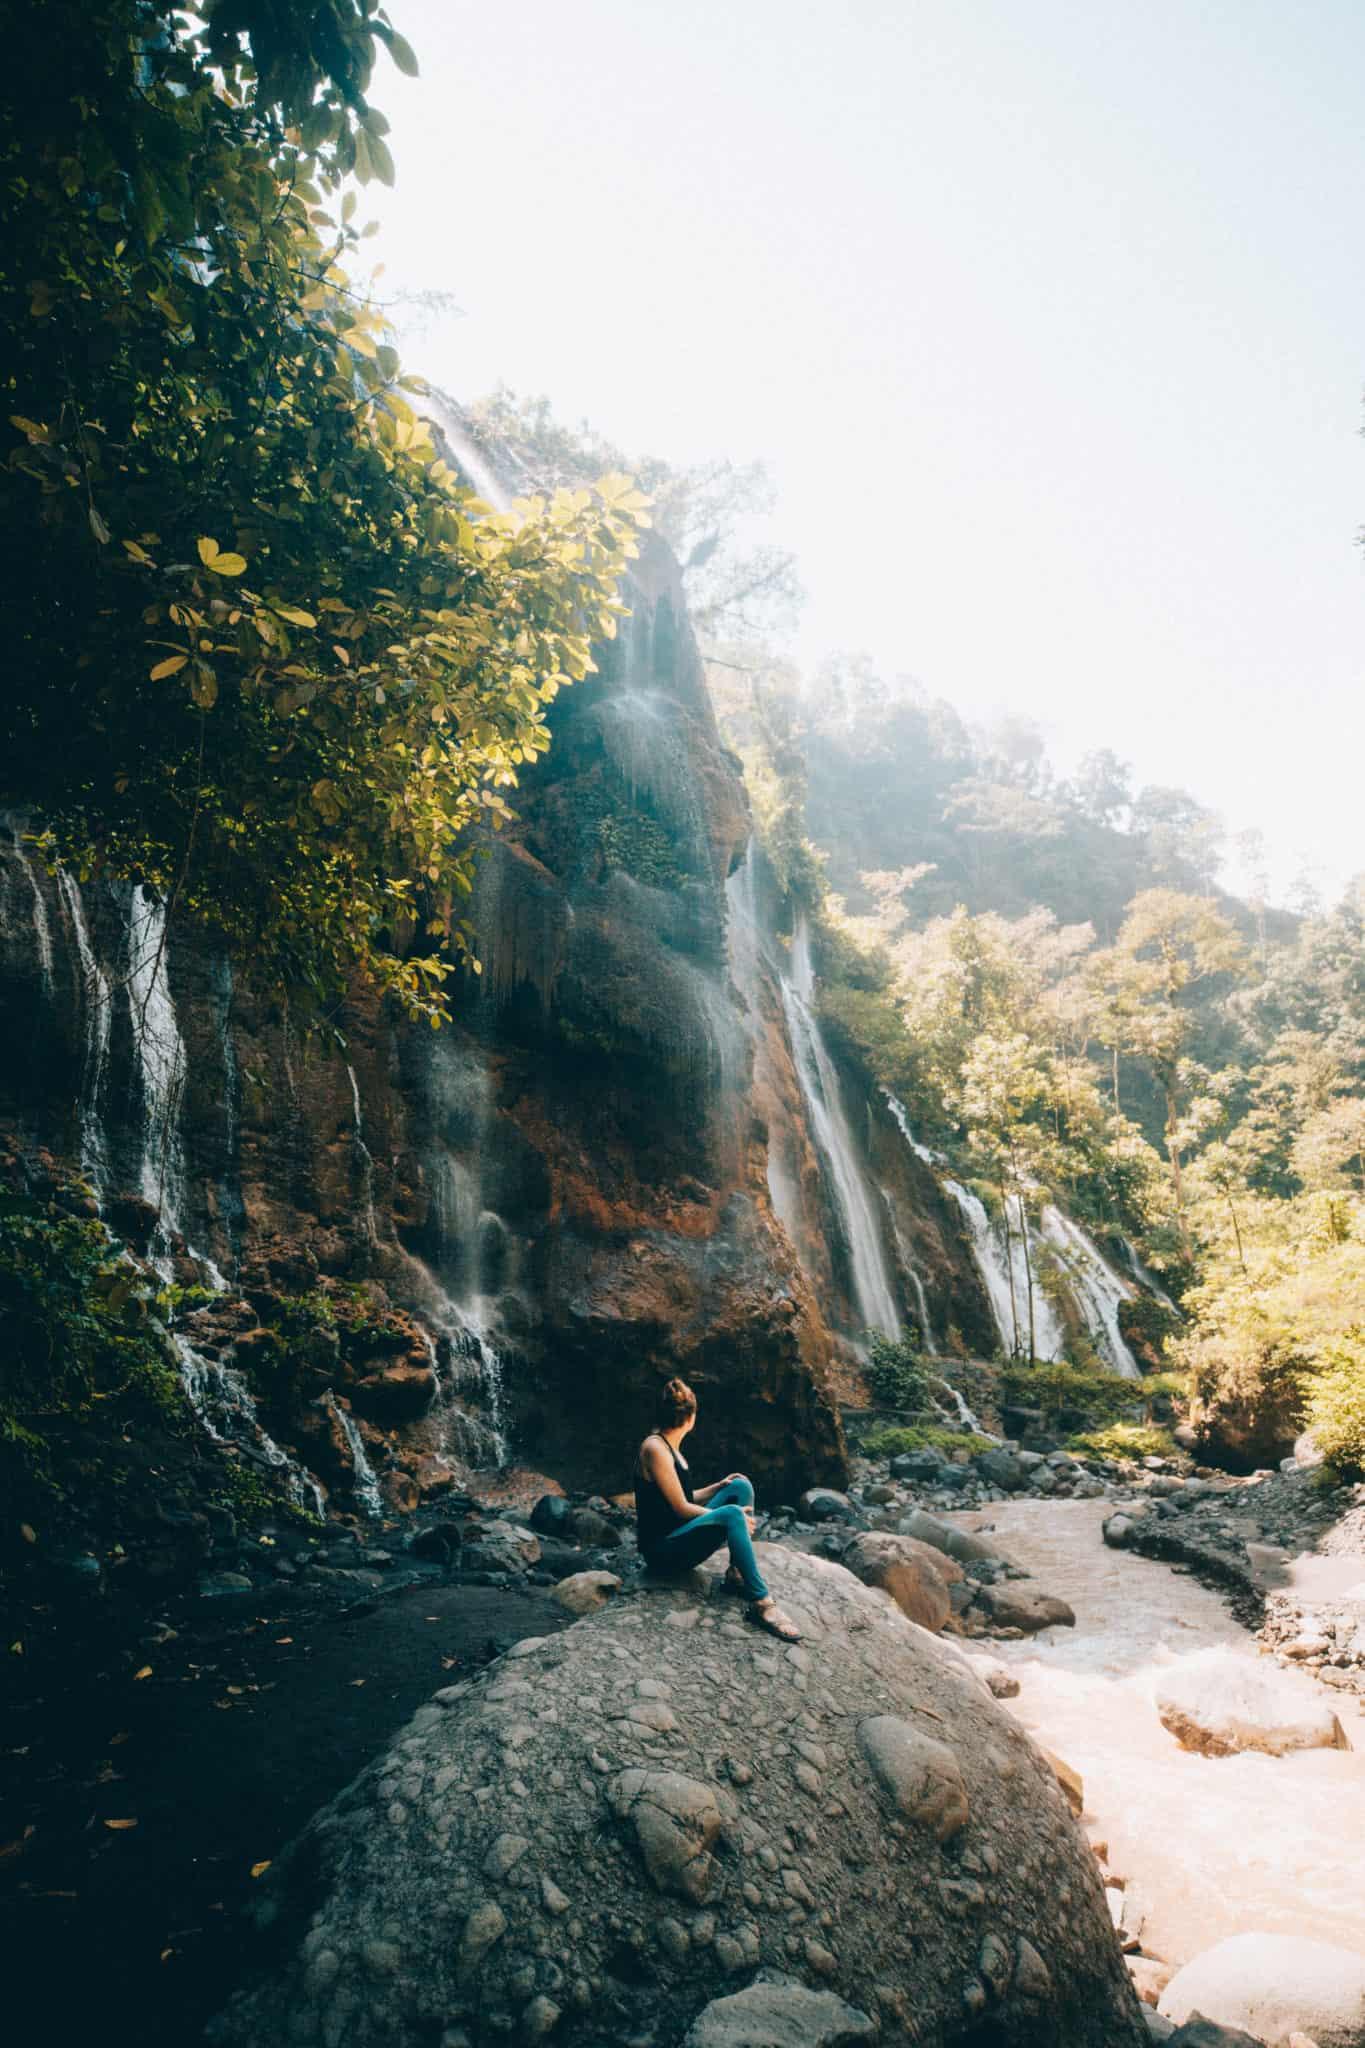 Goa Tetes - East Java Waterfalls